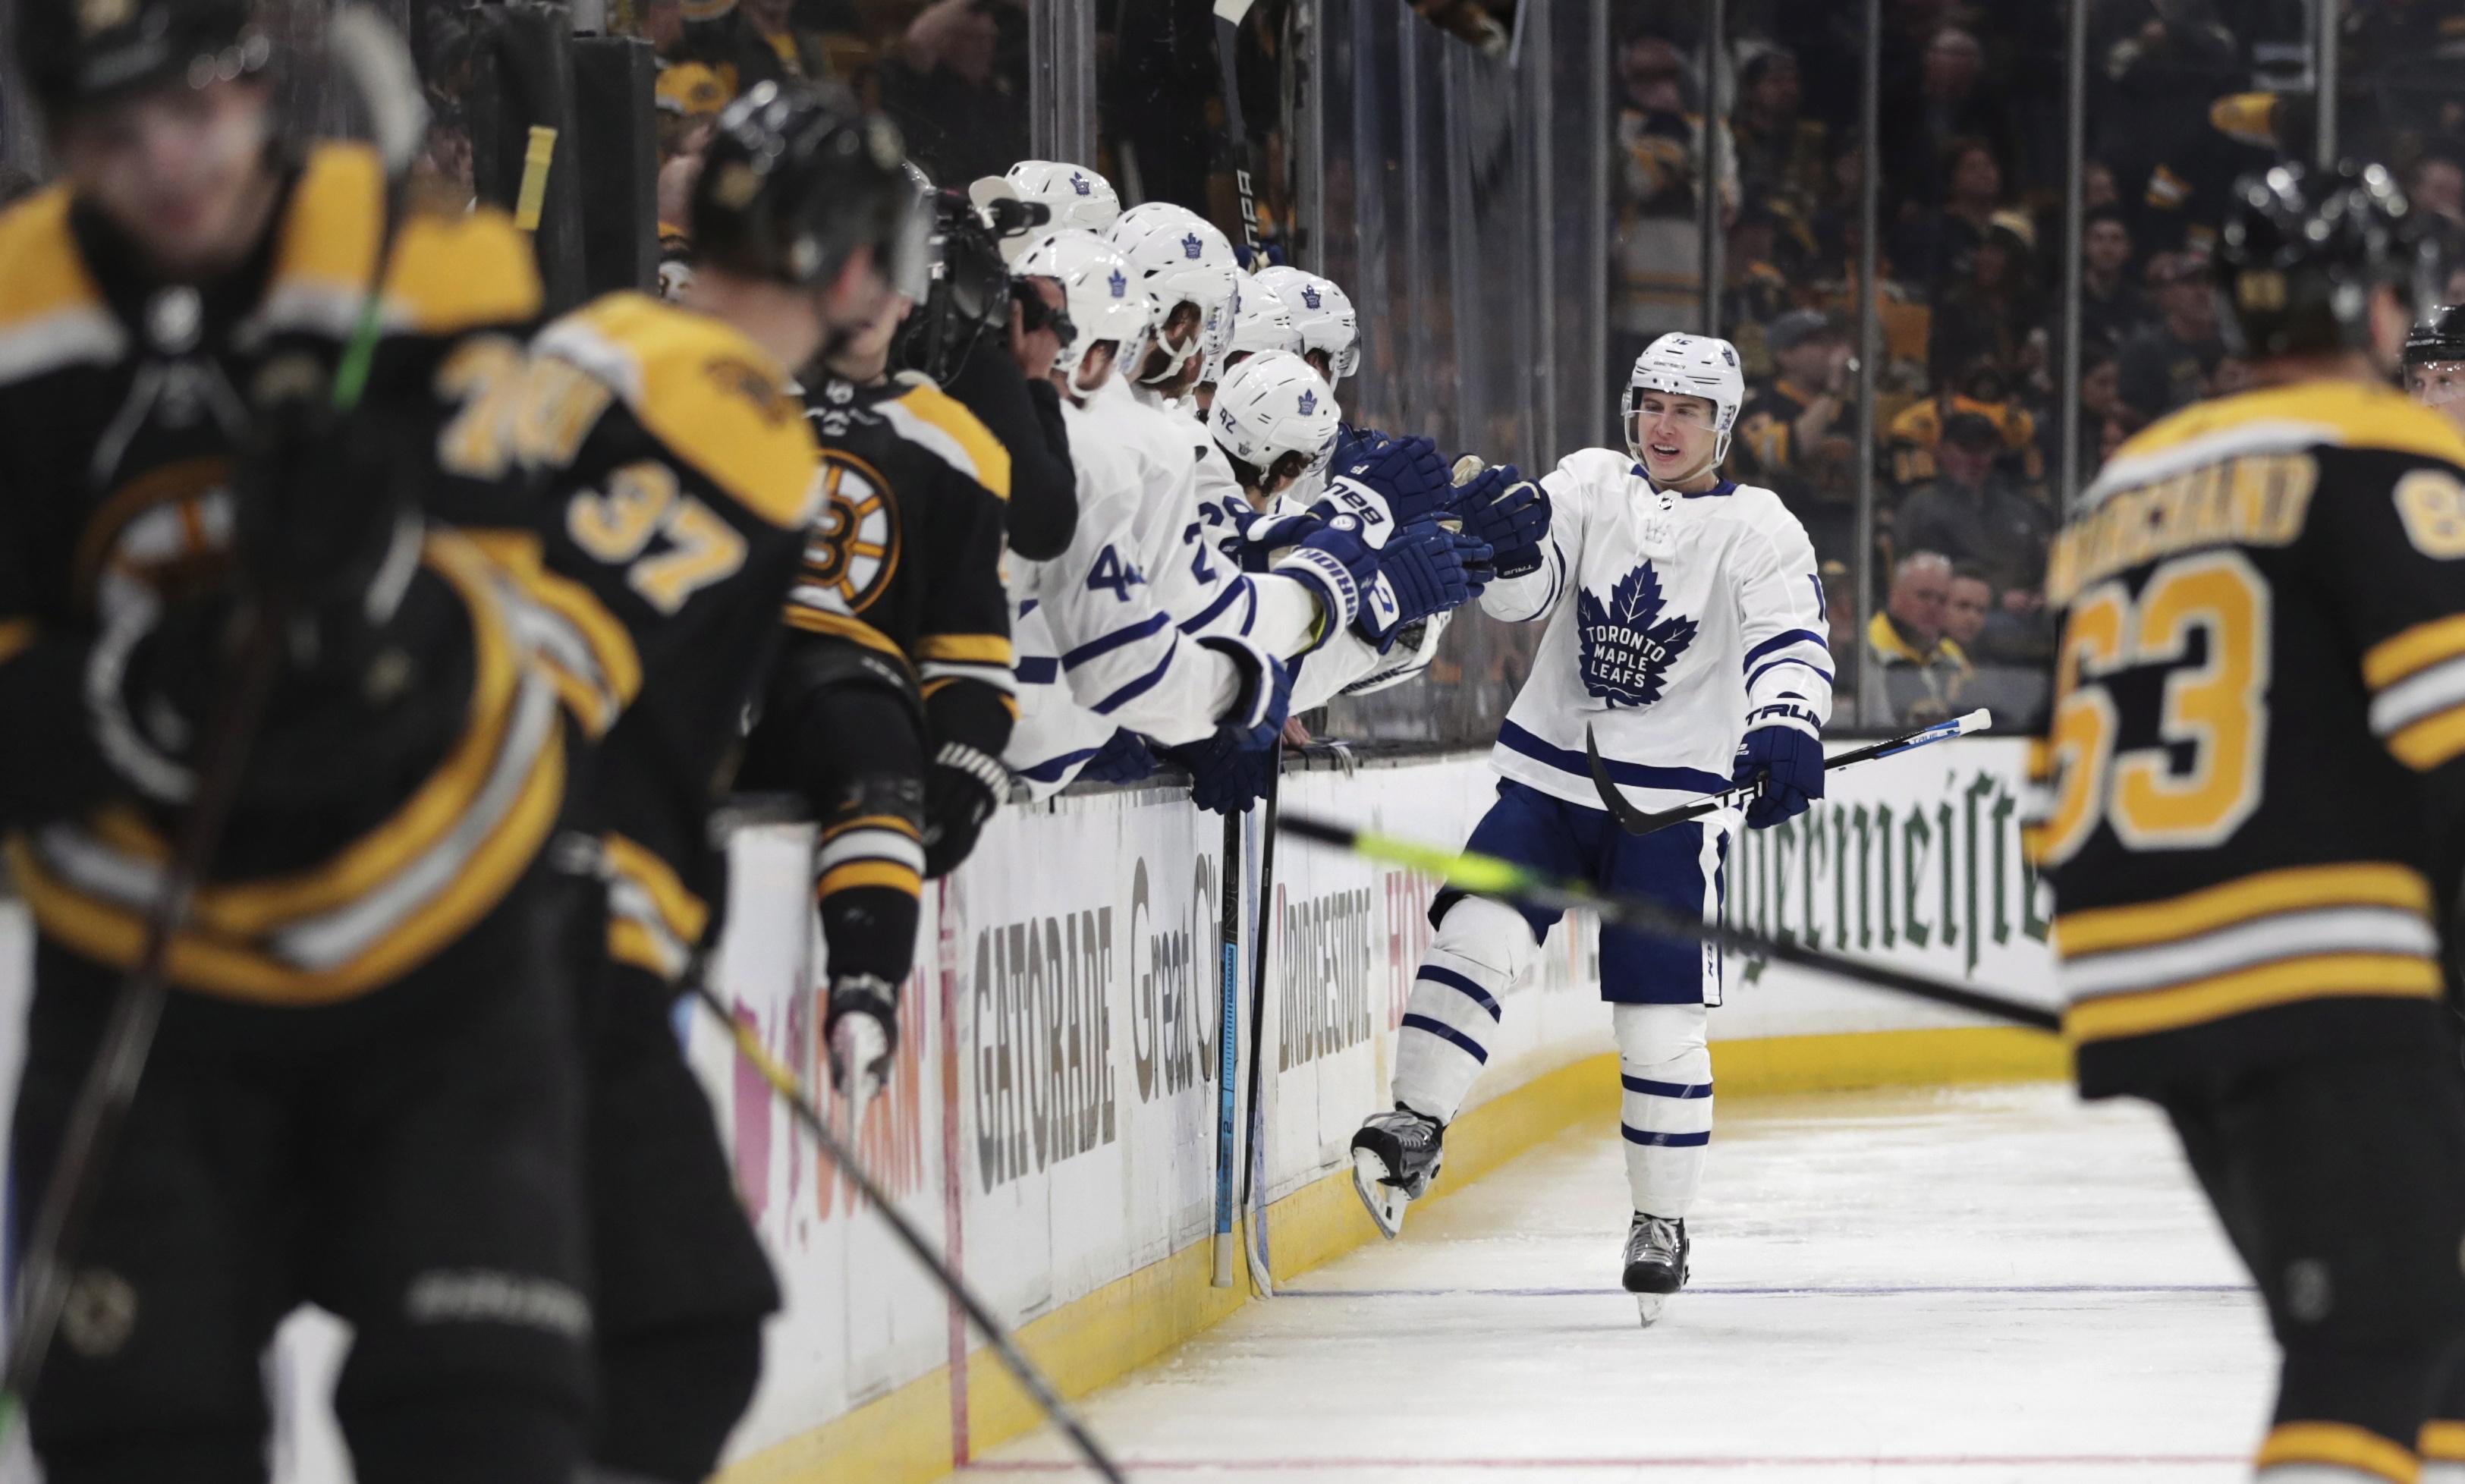 Leafs vs Bruins Game 1